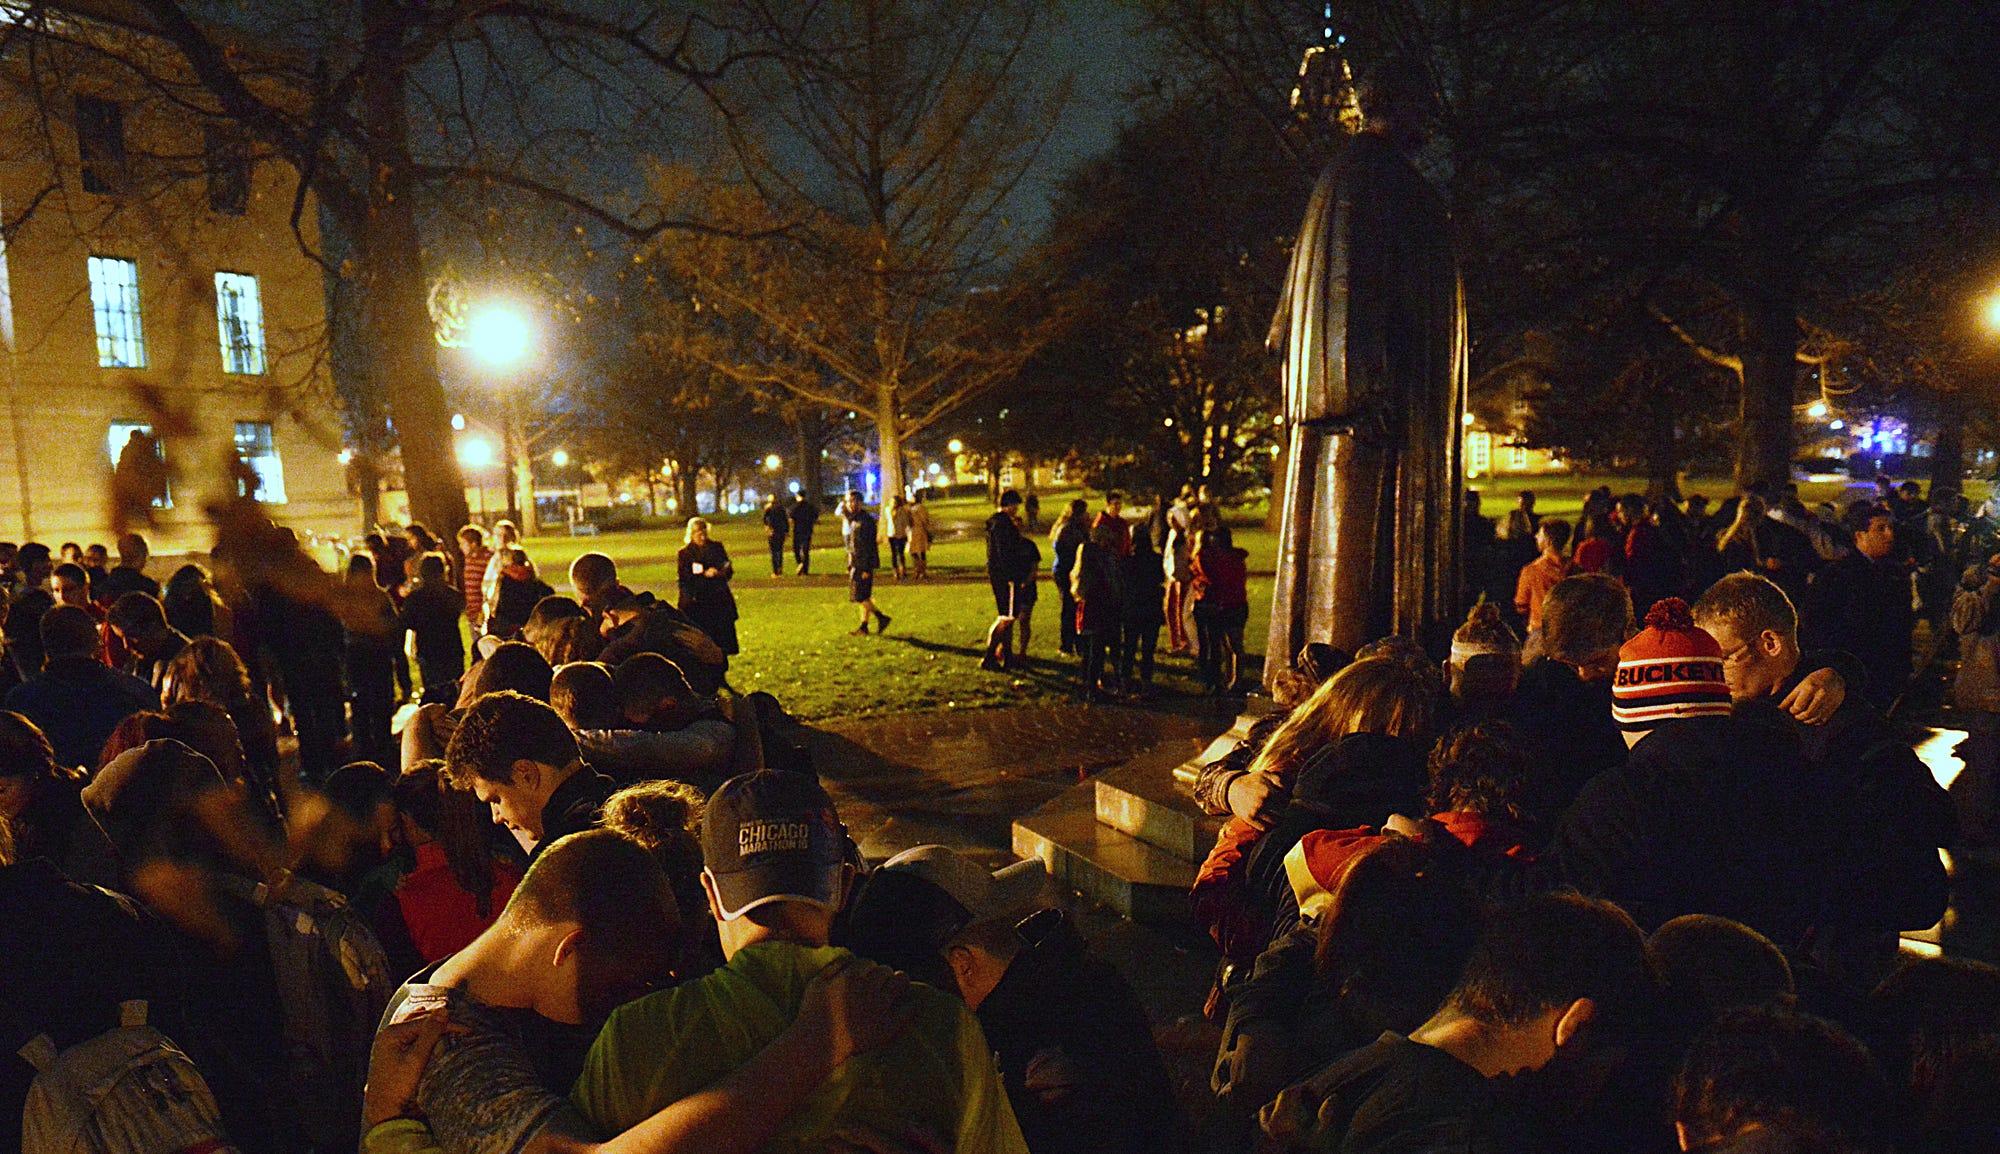 People gather at Ohio State University's Thompson Library to hold a vigil of prayer following death of football senior Kosta Karageorge on Nov. 30, 2014.